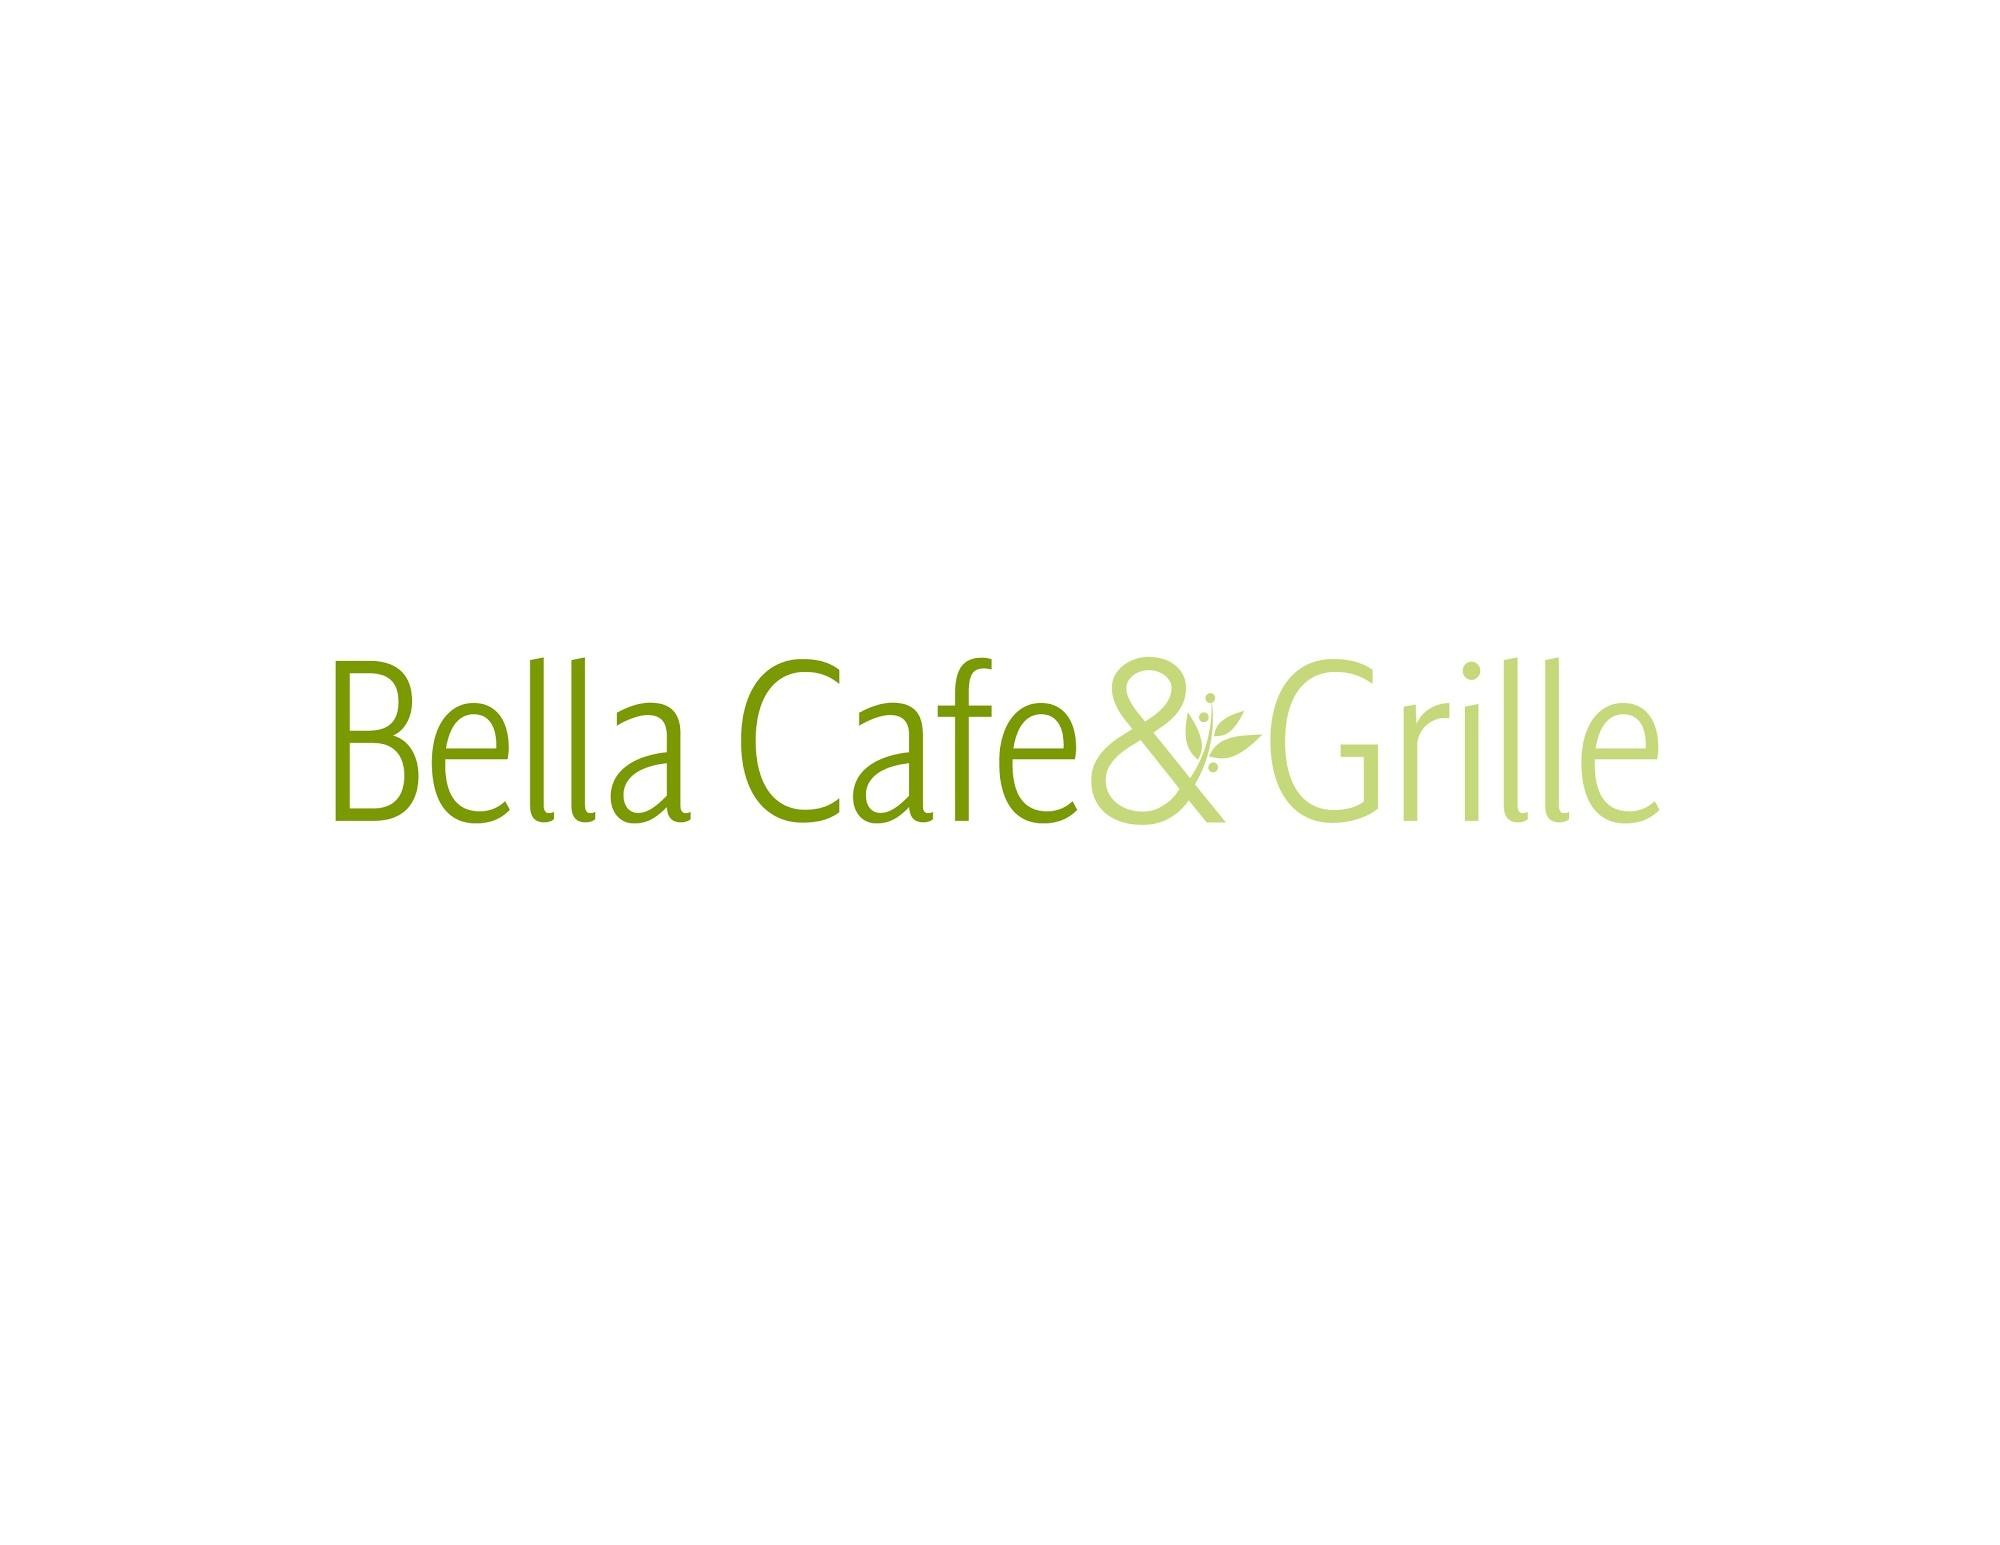 Bella Cafe and Grille 890 E High St, Lexington